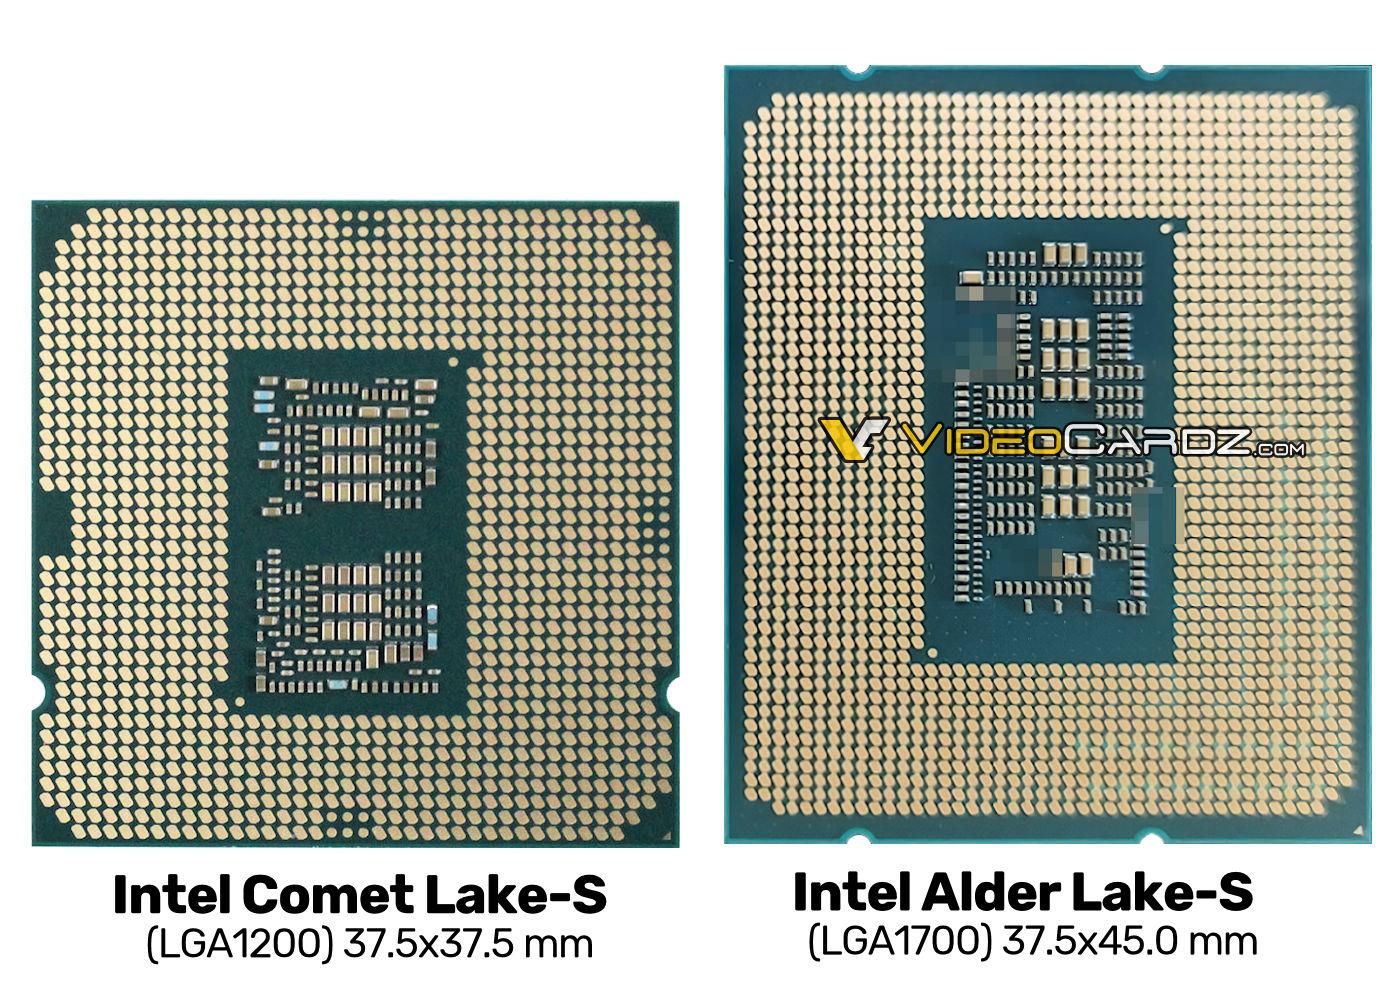 Intel Alder Lake S vs Intel Comet Lake S 0